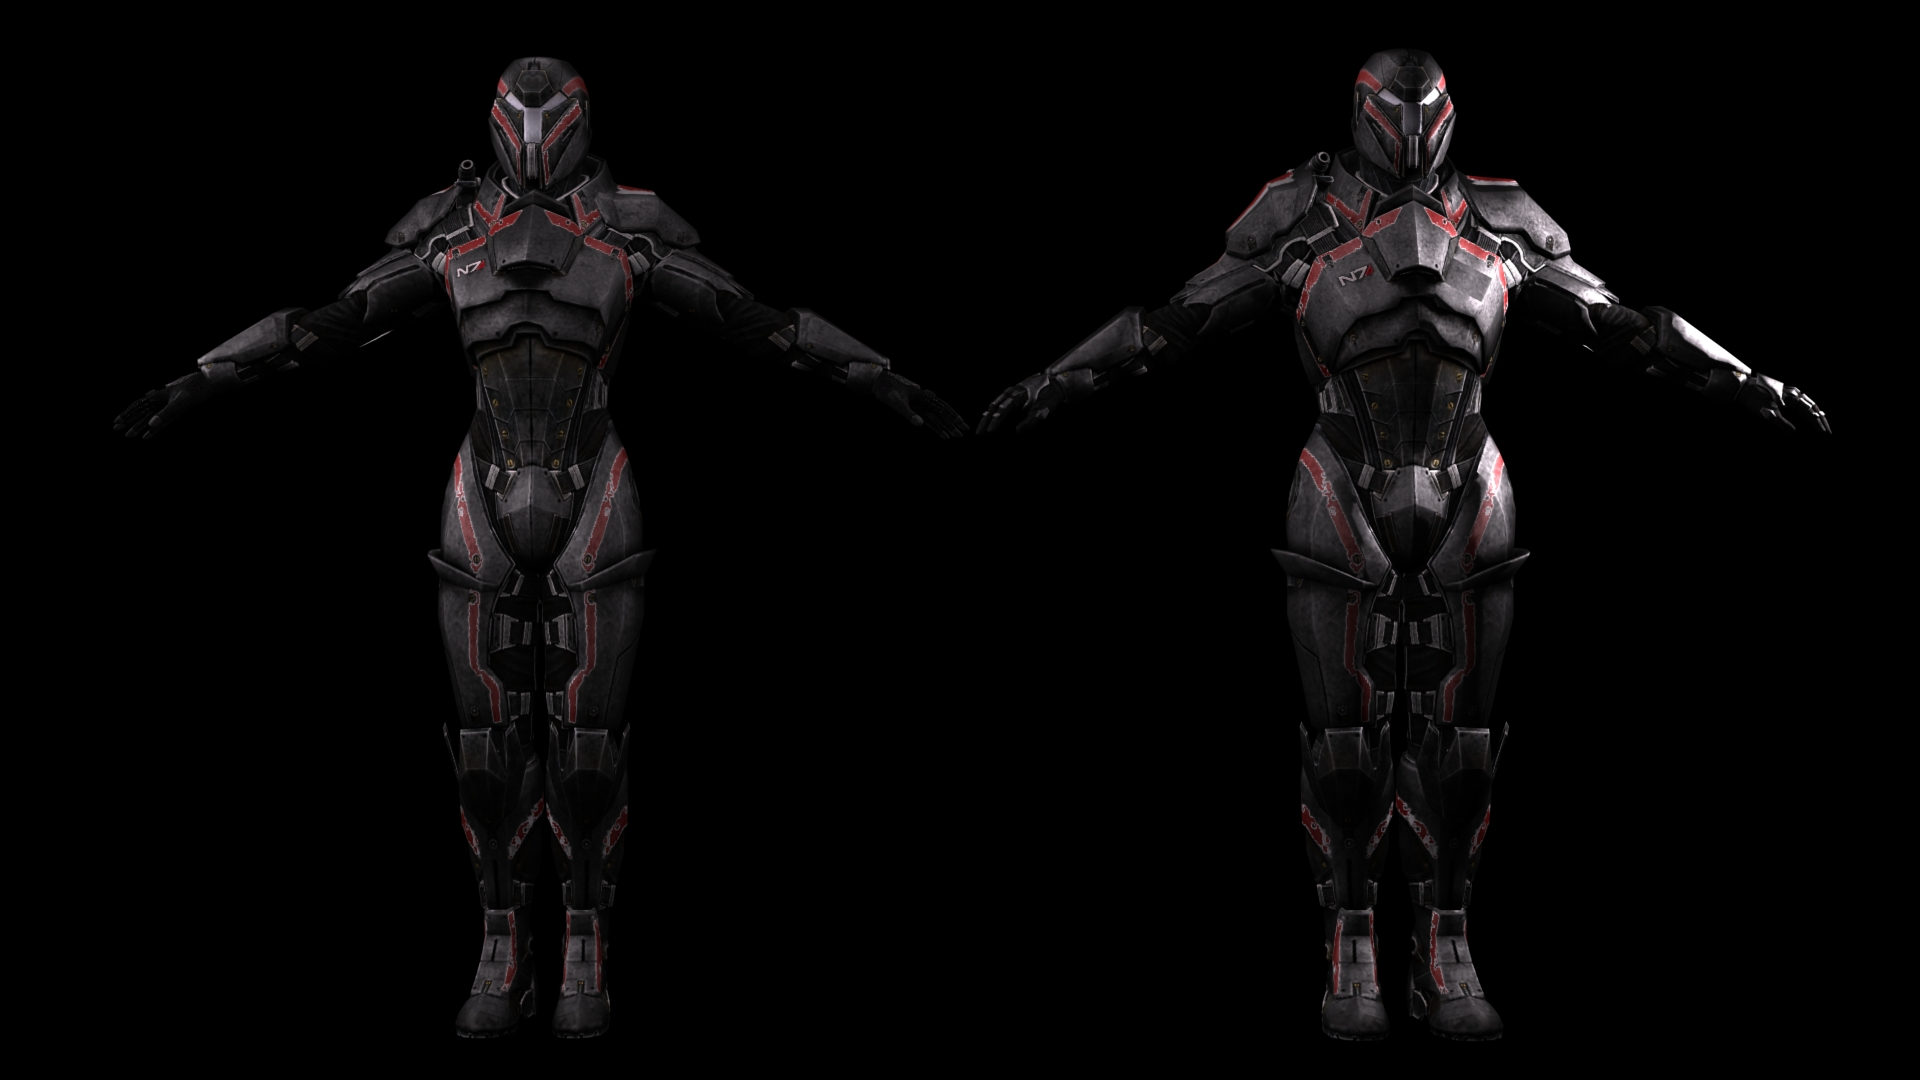 T5-V Battle Suit for females by lsquall on DeviantArt